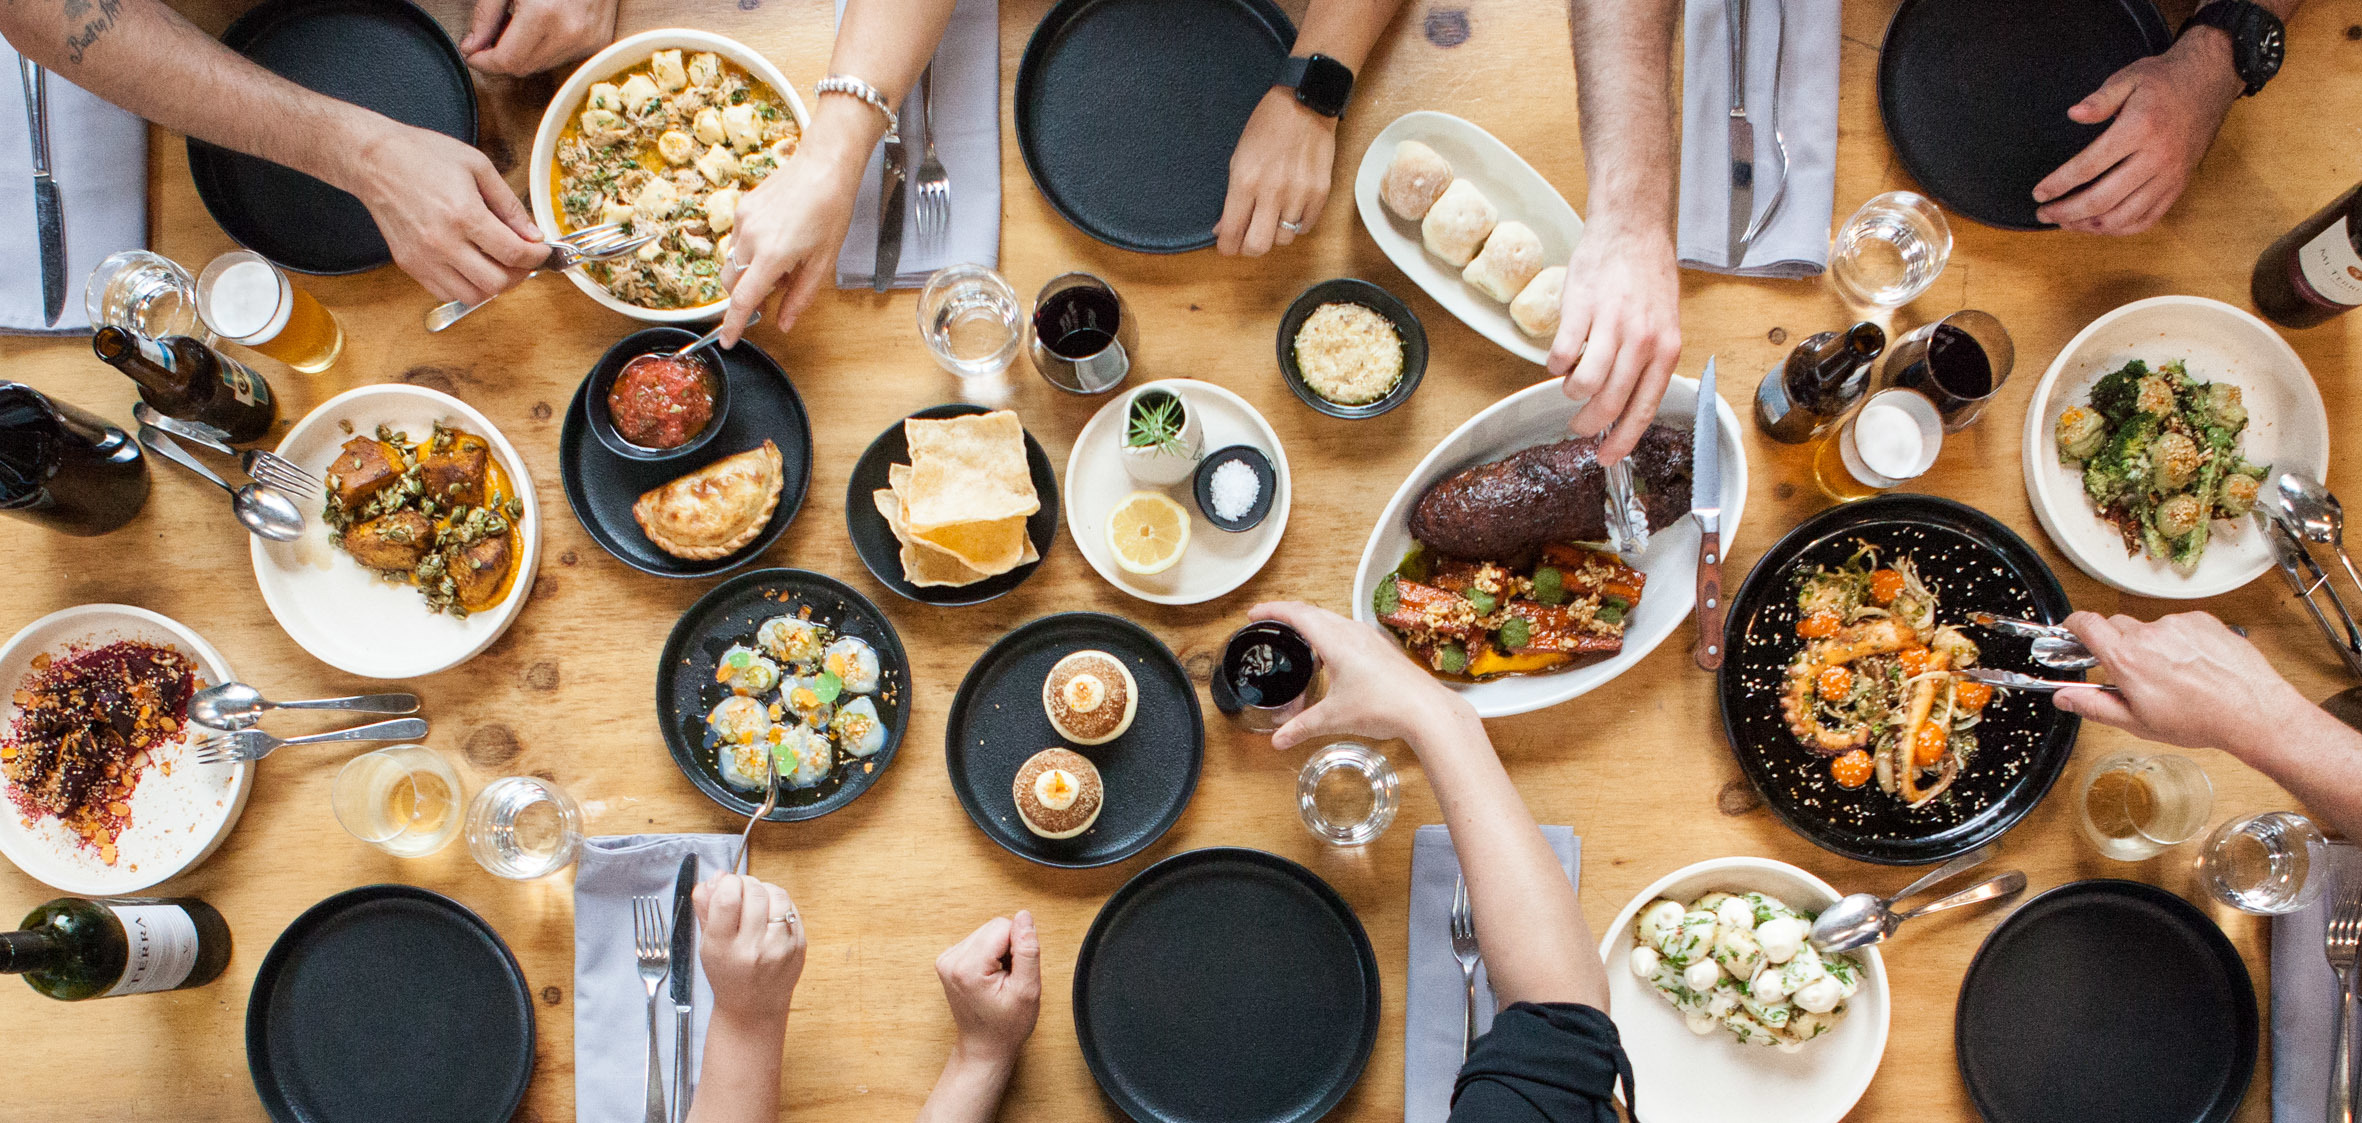 Food spread across table